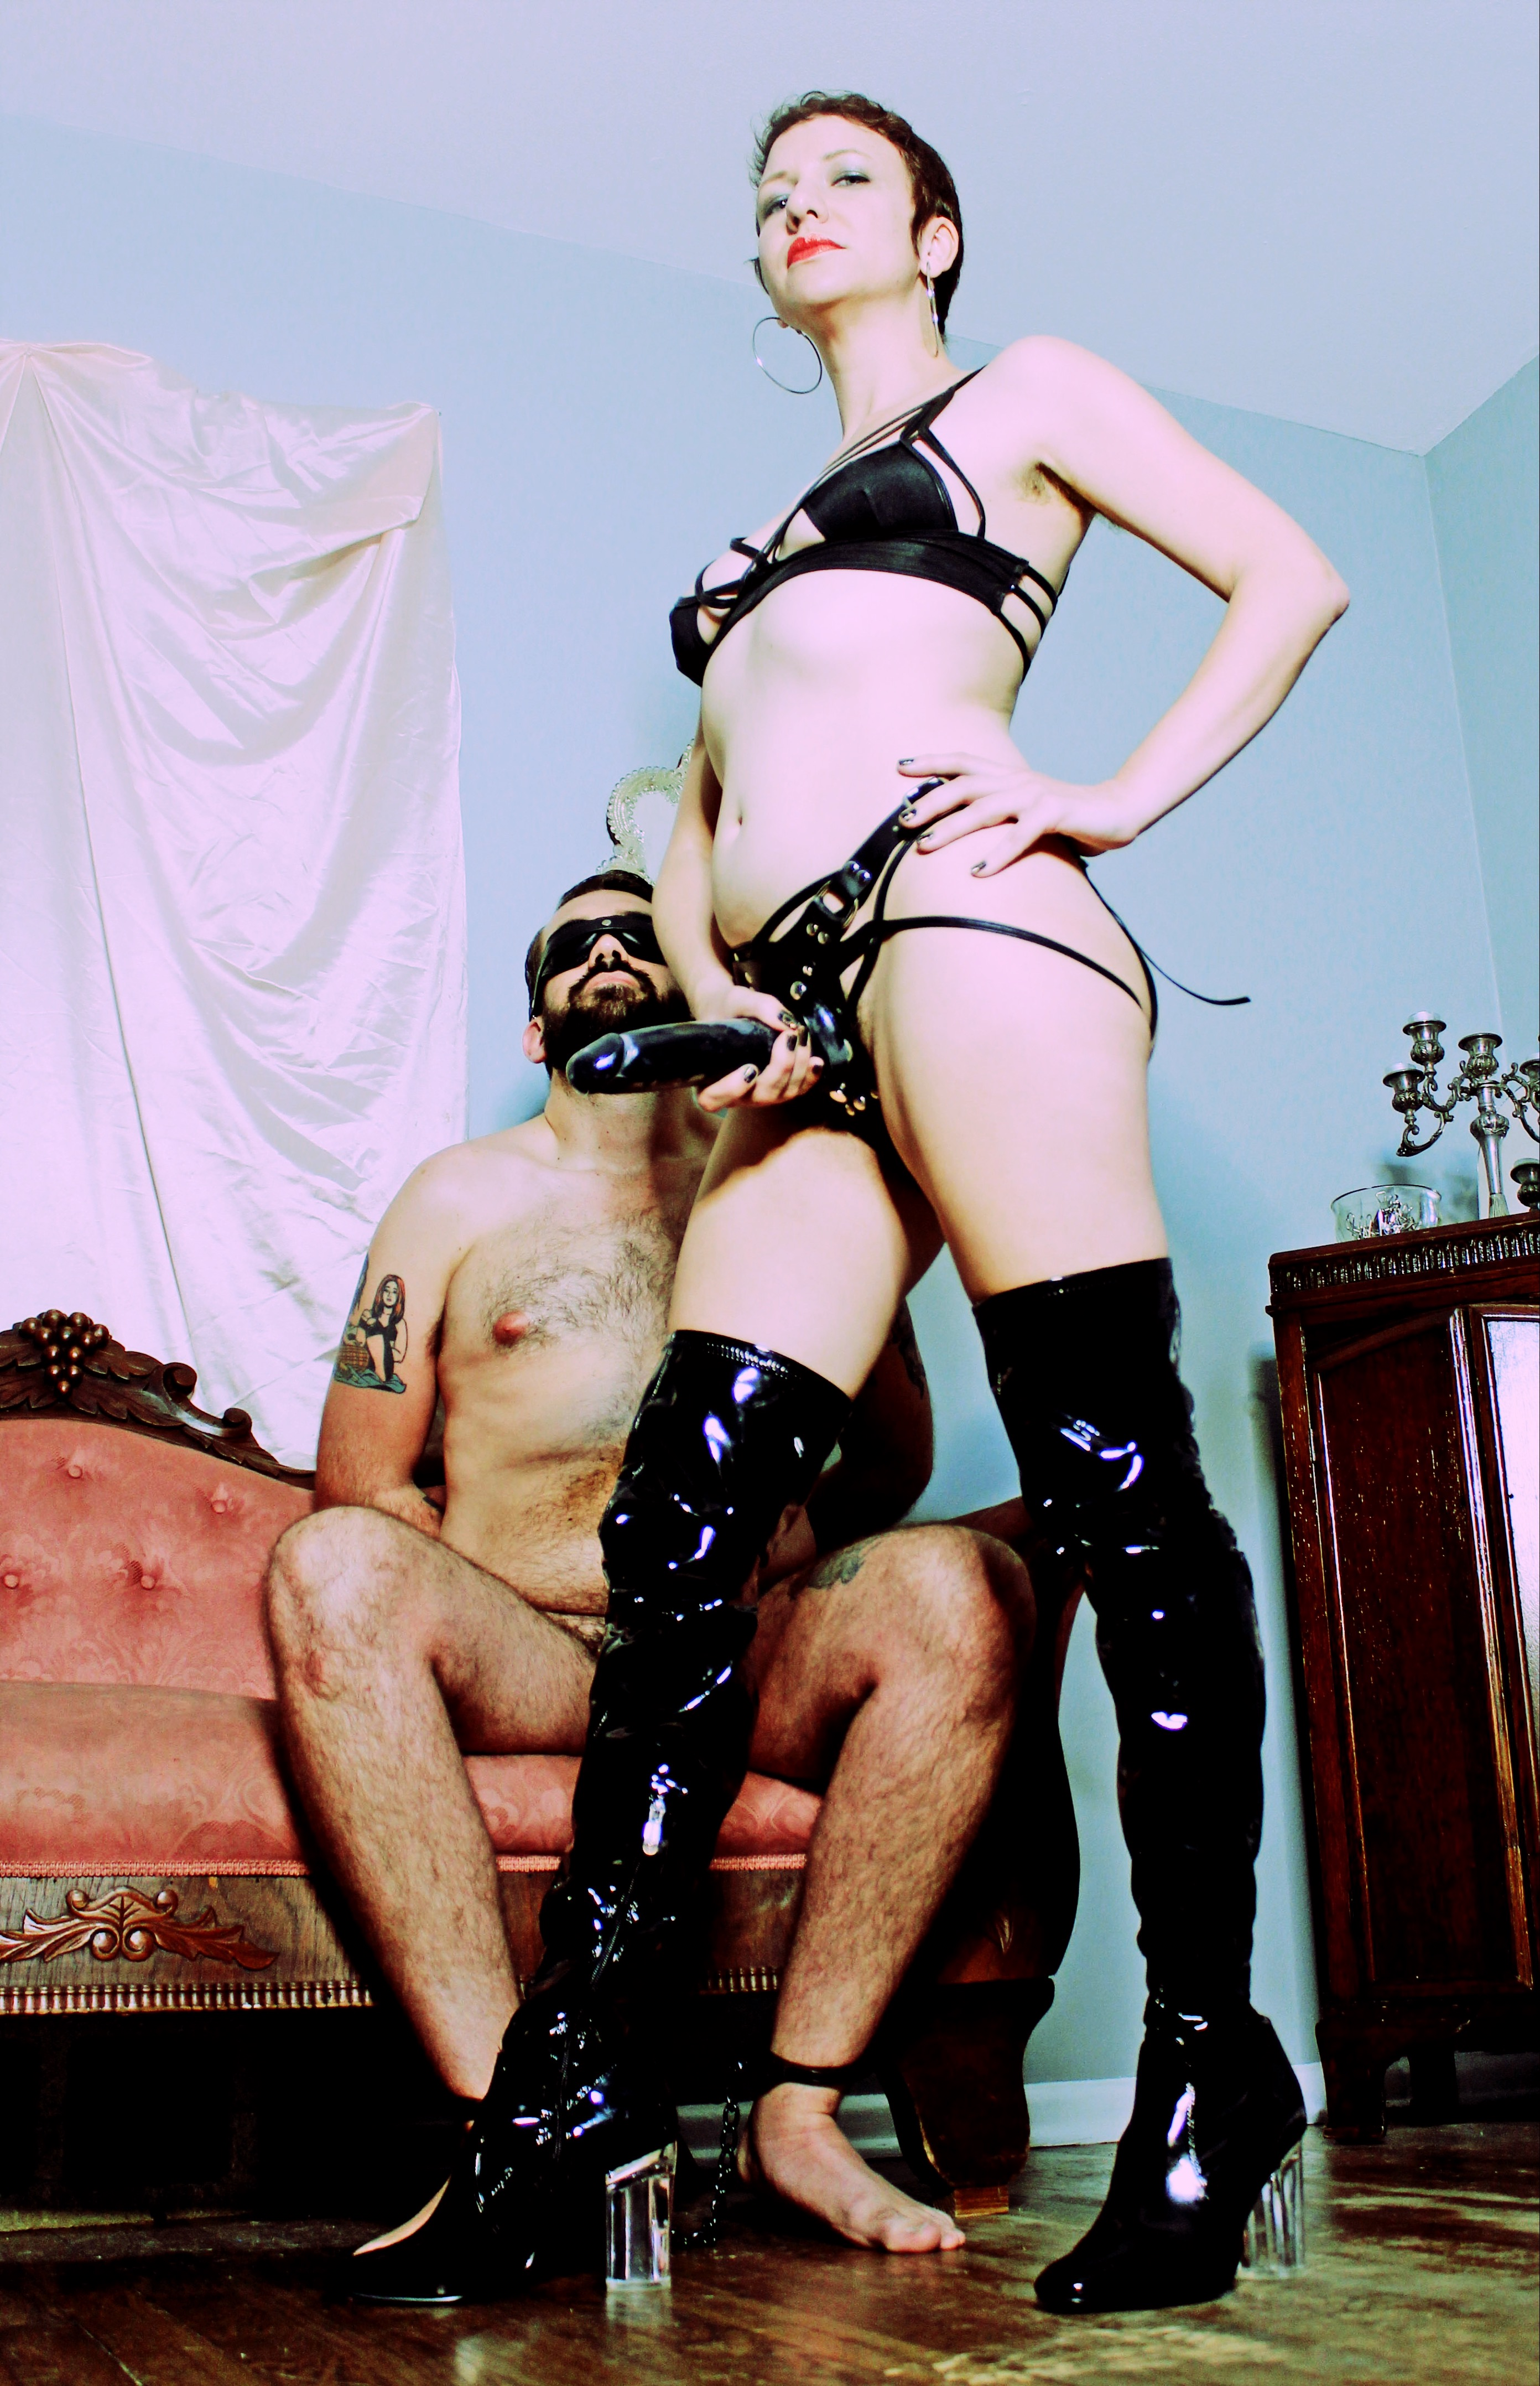 Domme Discordia boots professional dominatrix prodomme femdomme austin texas bay area california oakland san francisco